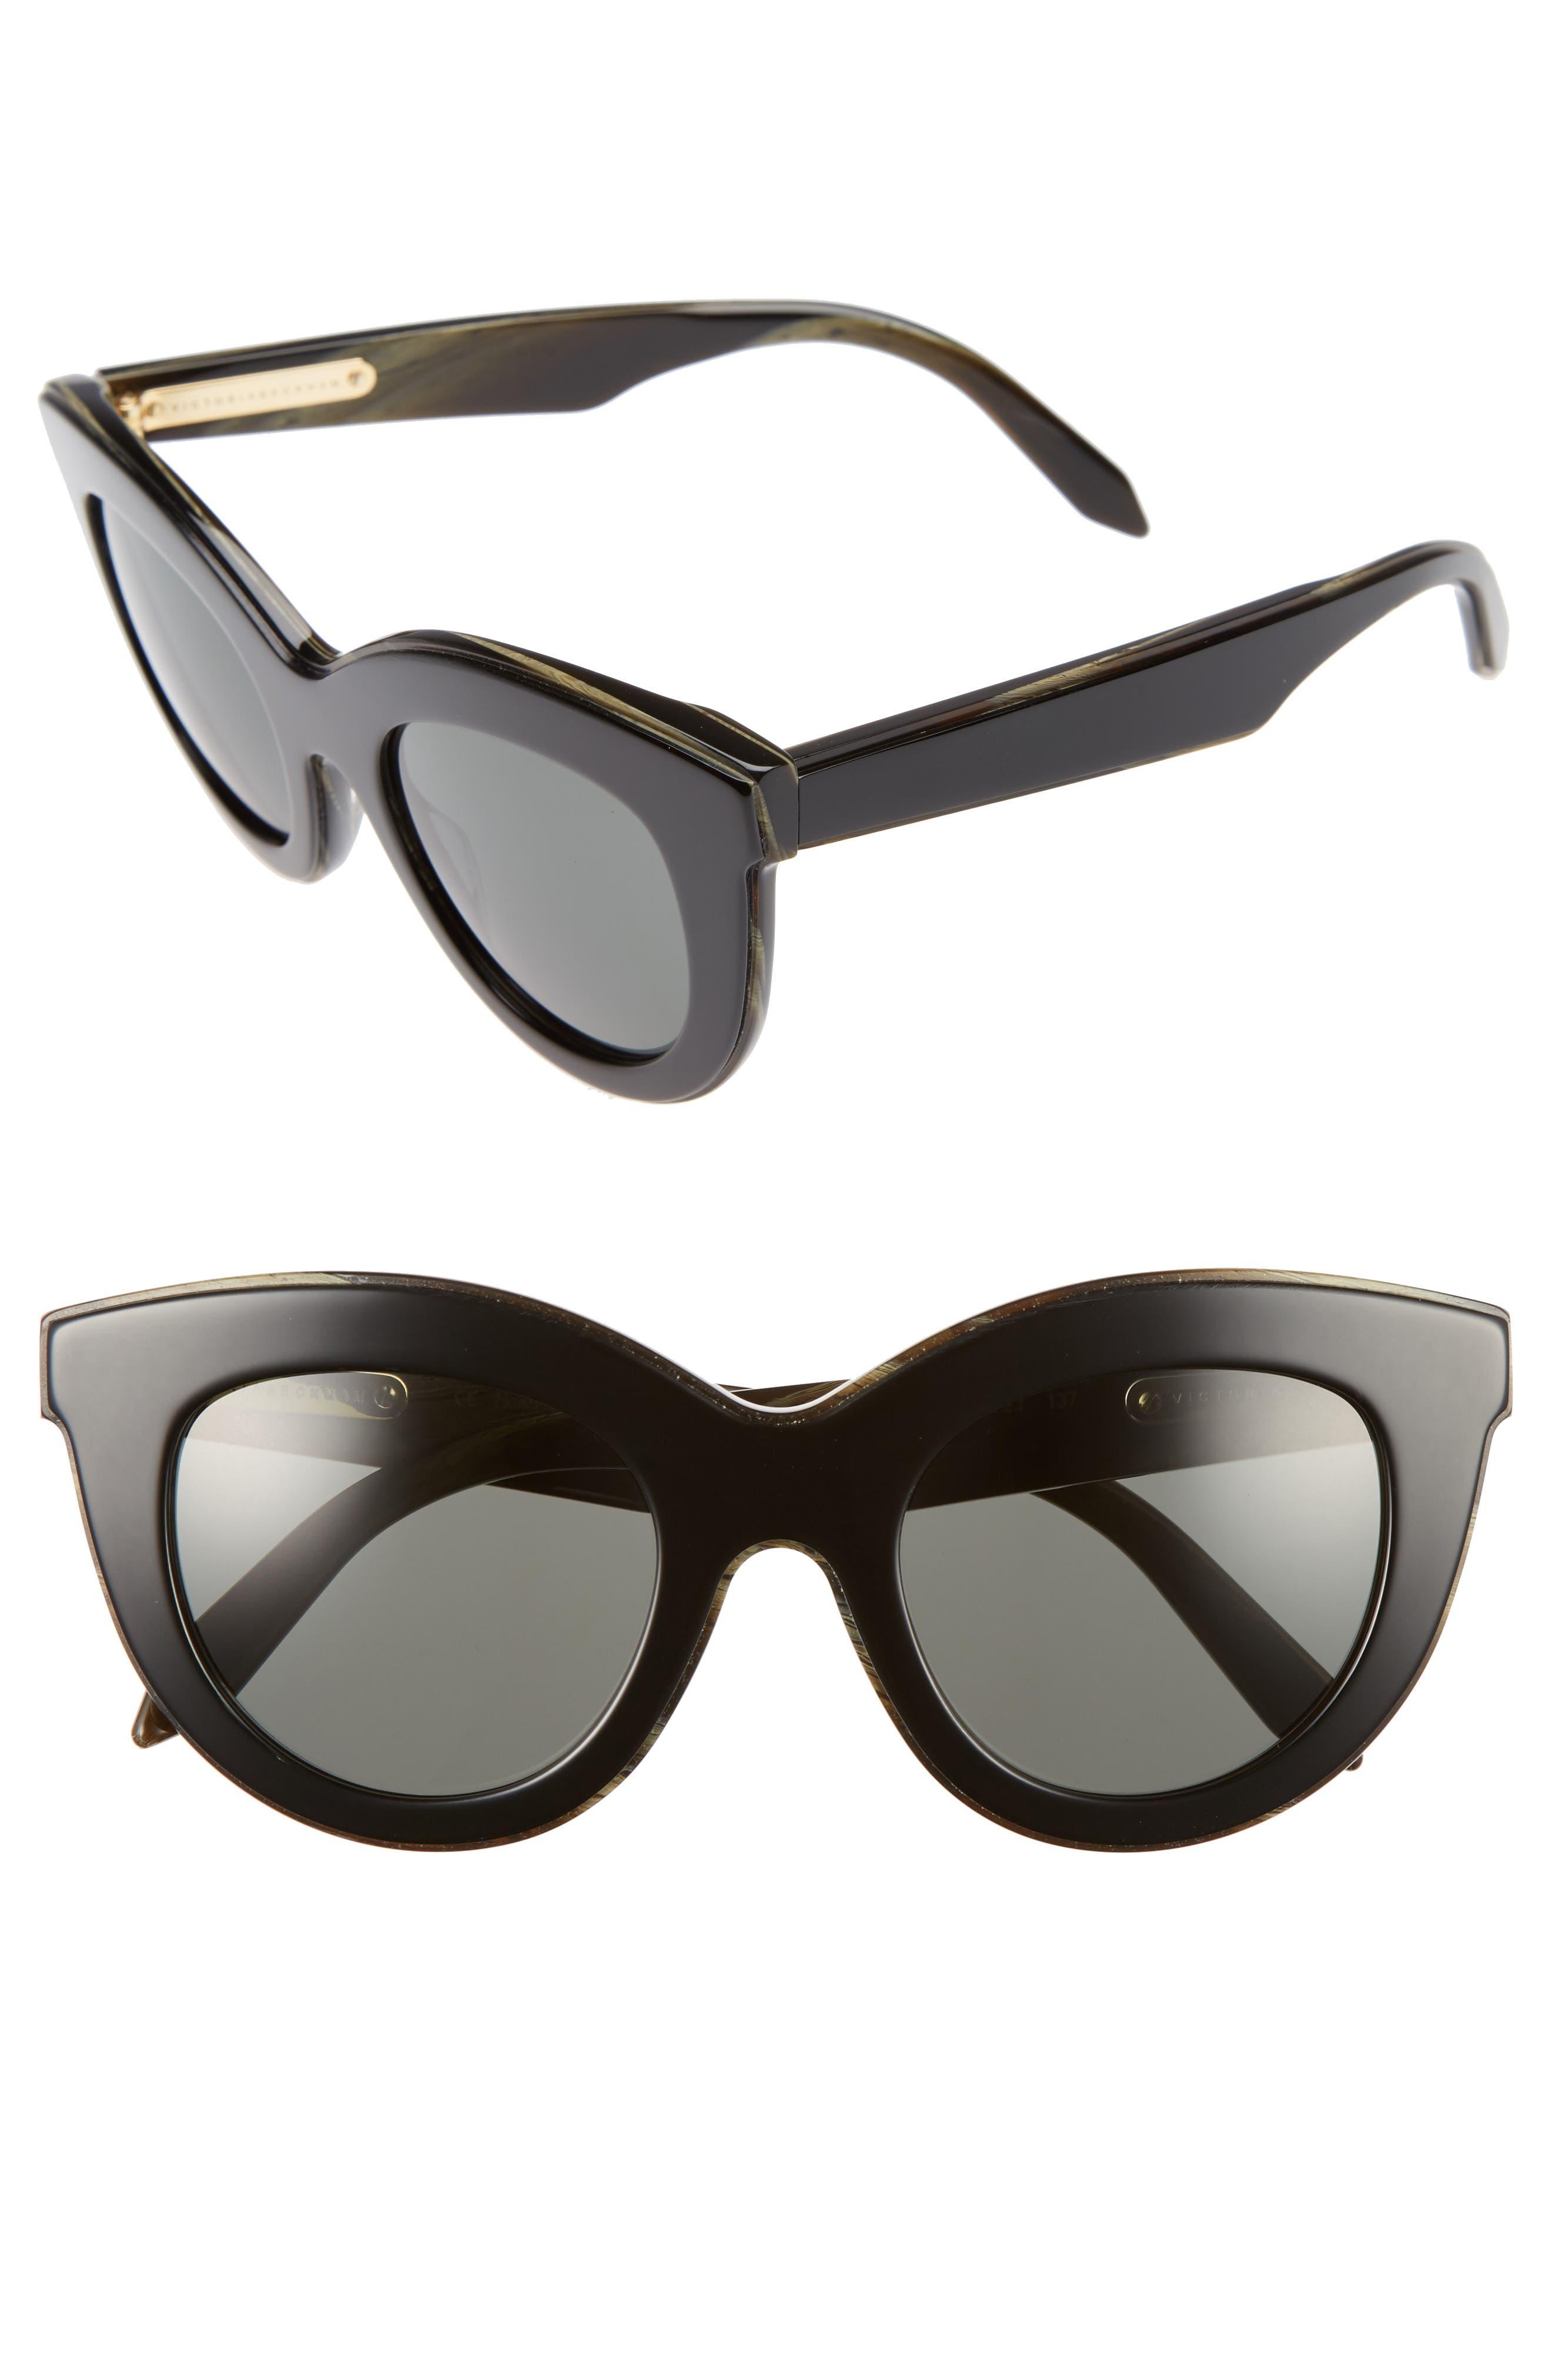 Main Image - Victoria Beckham 49mm Cat Eye Sunglasses